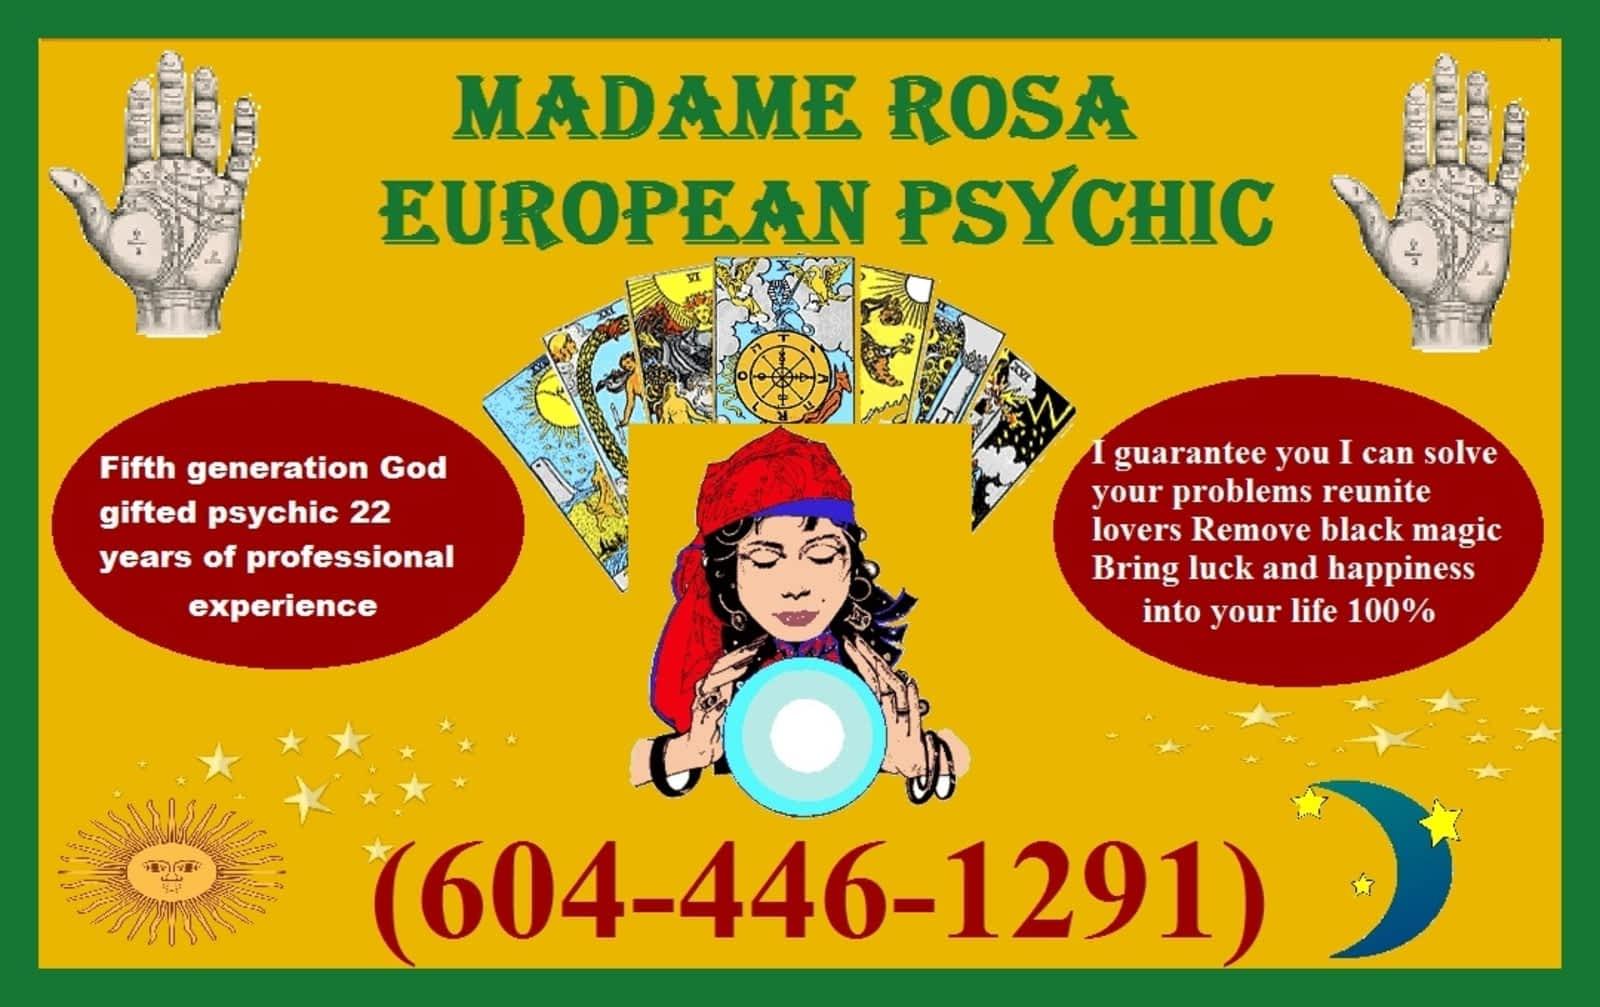 Rosa's psychic studio psychic reader spellcaster spiritual healer